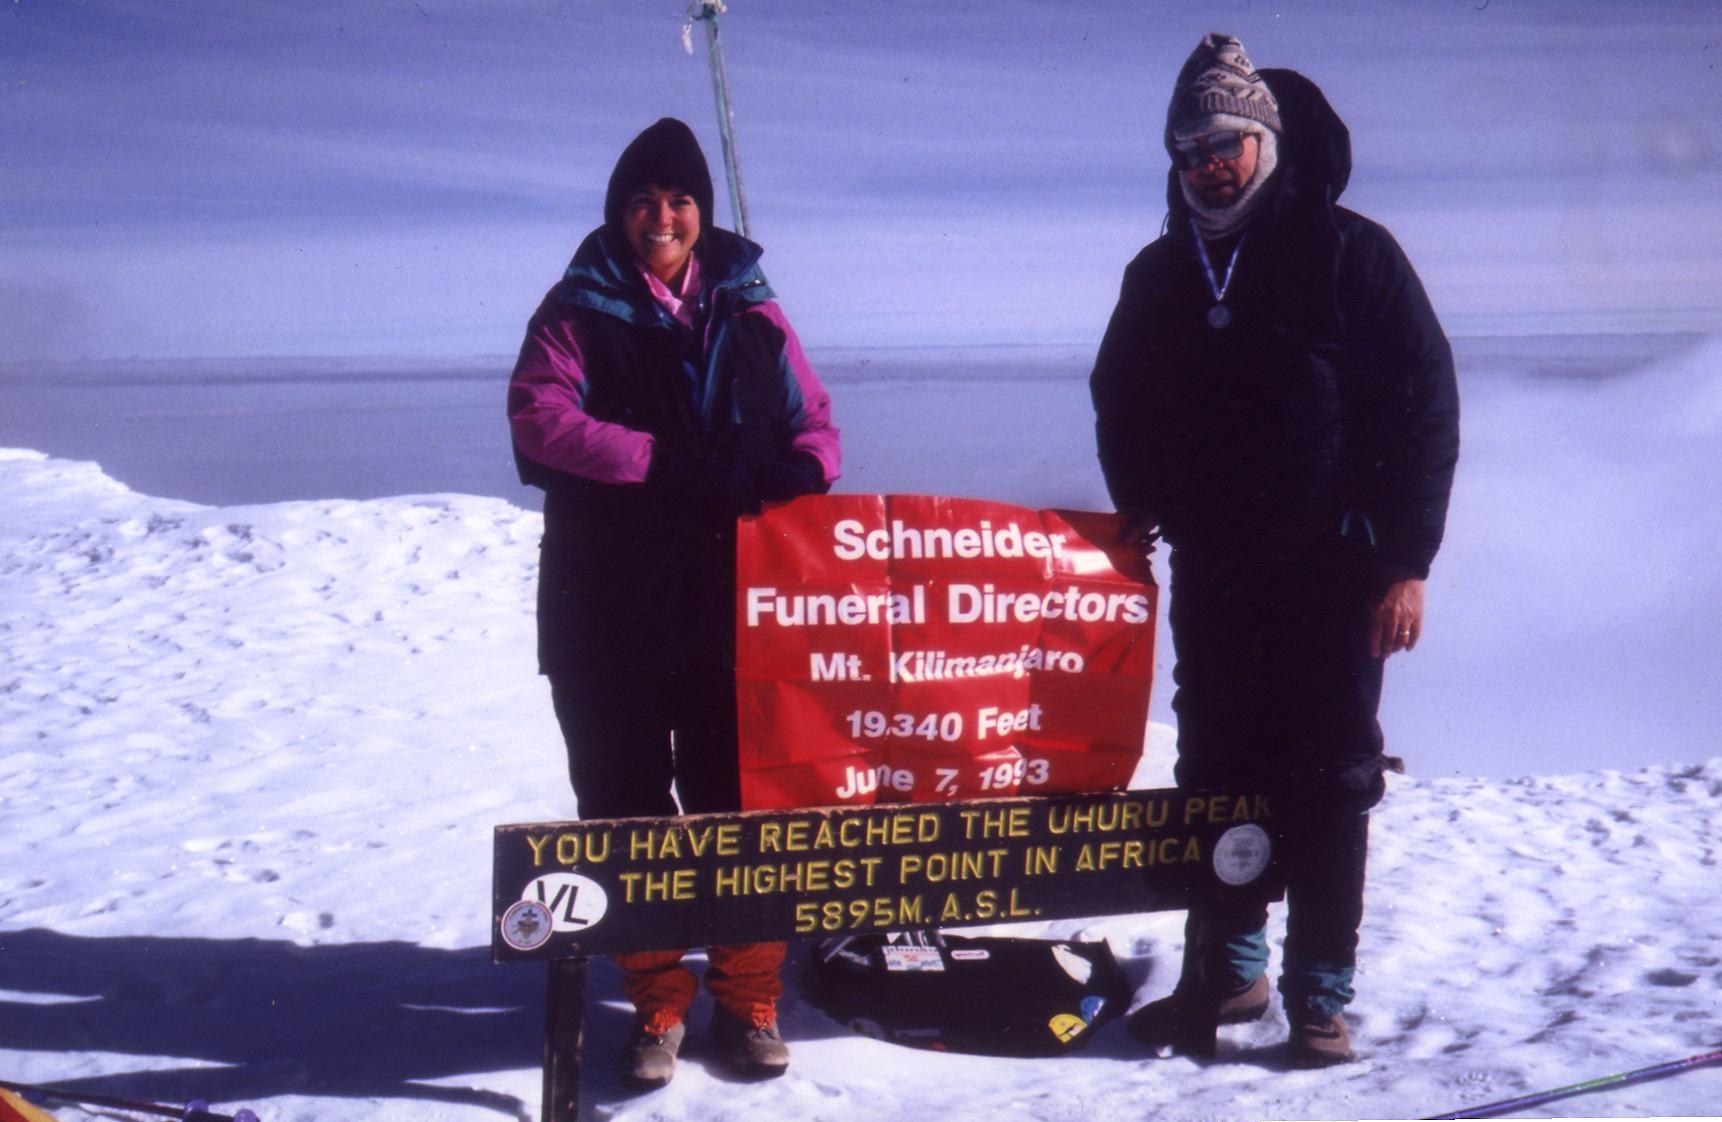 lori-schneider-and-father-neil-on-summit-of-mount-killimanjaro-1993